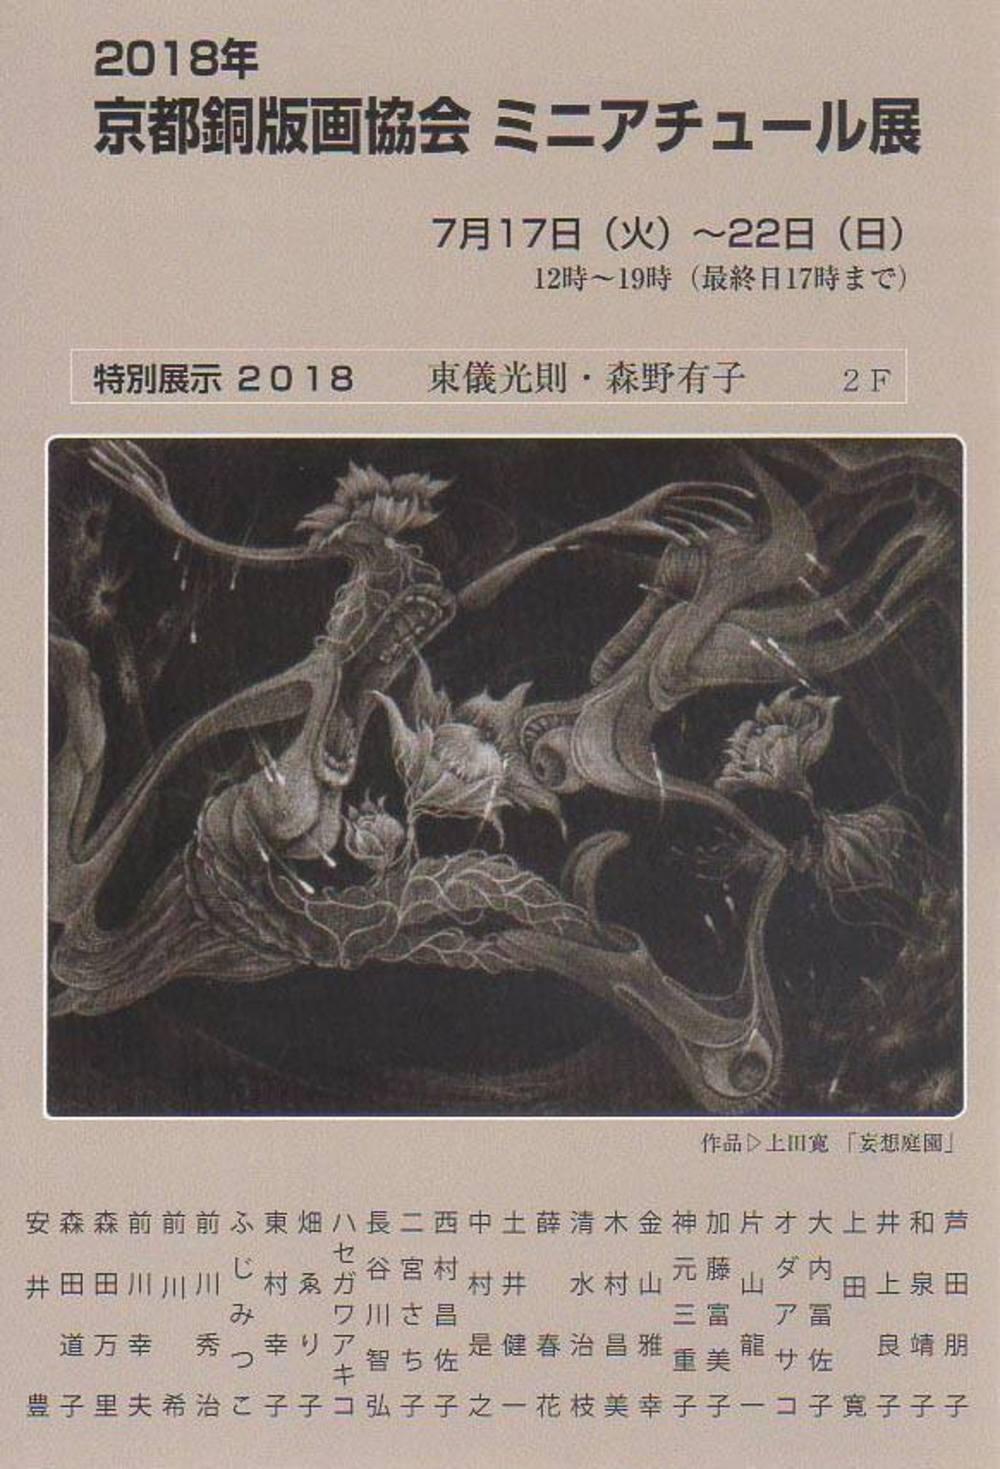 京都銅版画協会特別展示 森野有子 東儀光則 展のお知らせ2